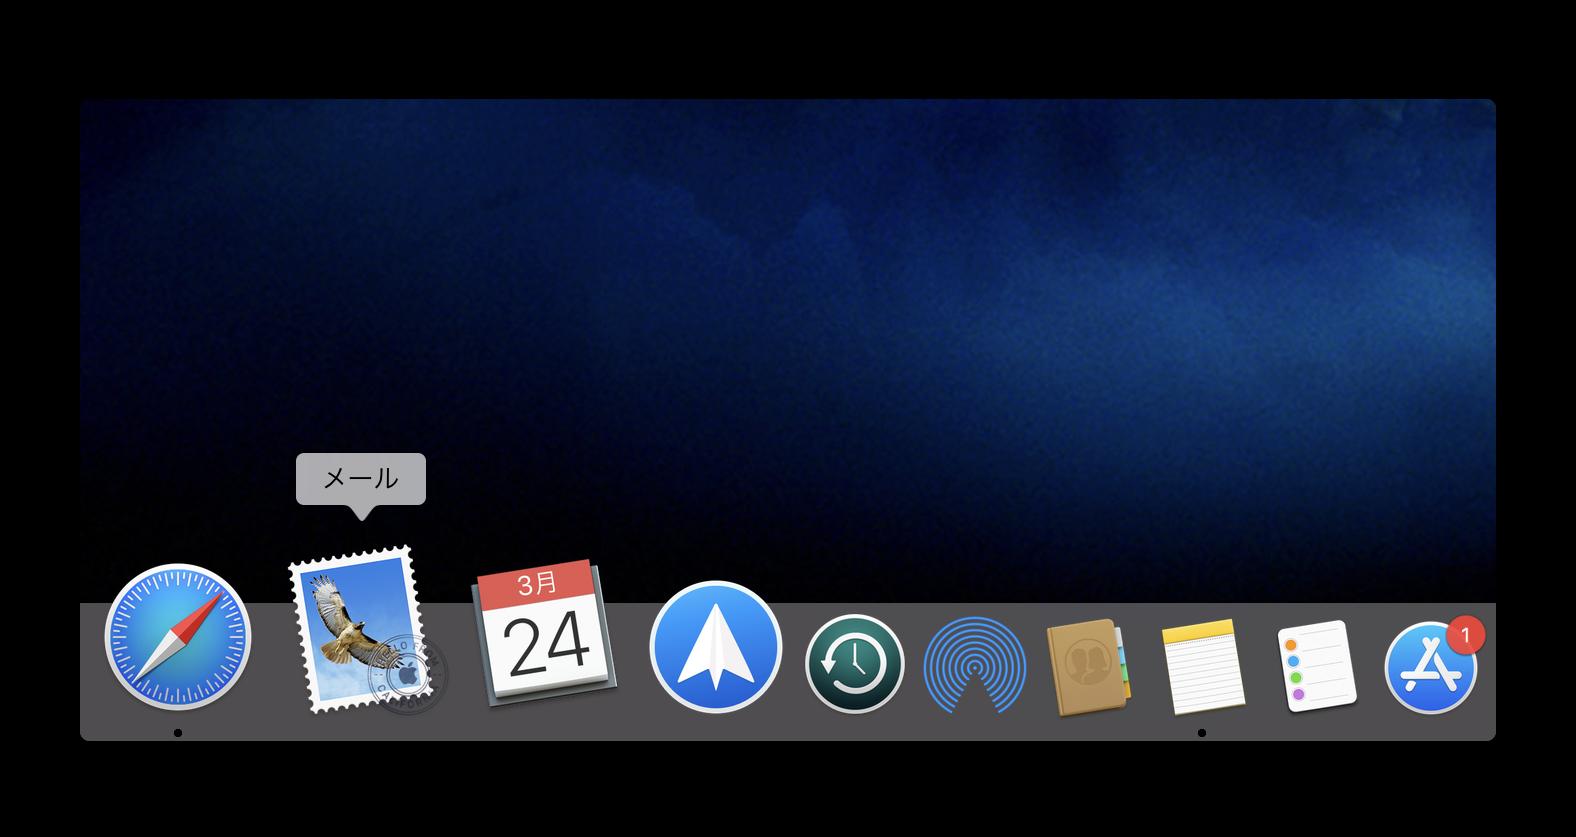 【Mac】非表示アプリケーションをDockで薄暗く表示する方法